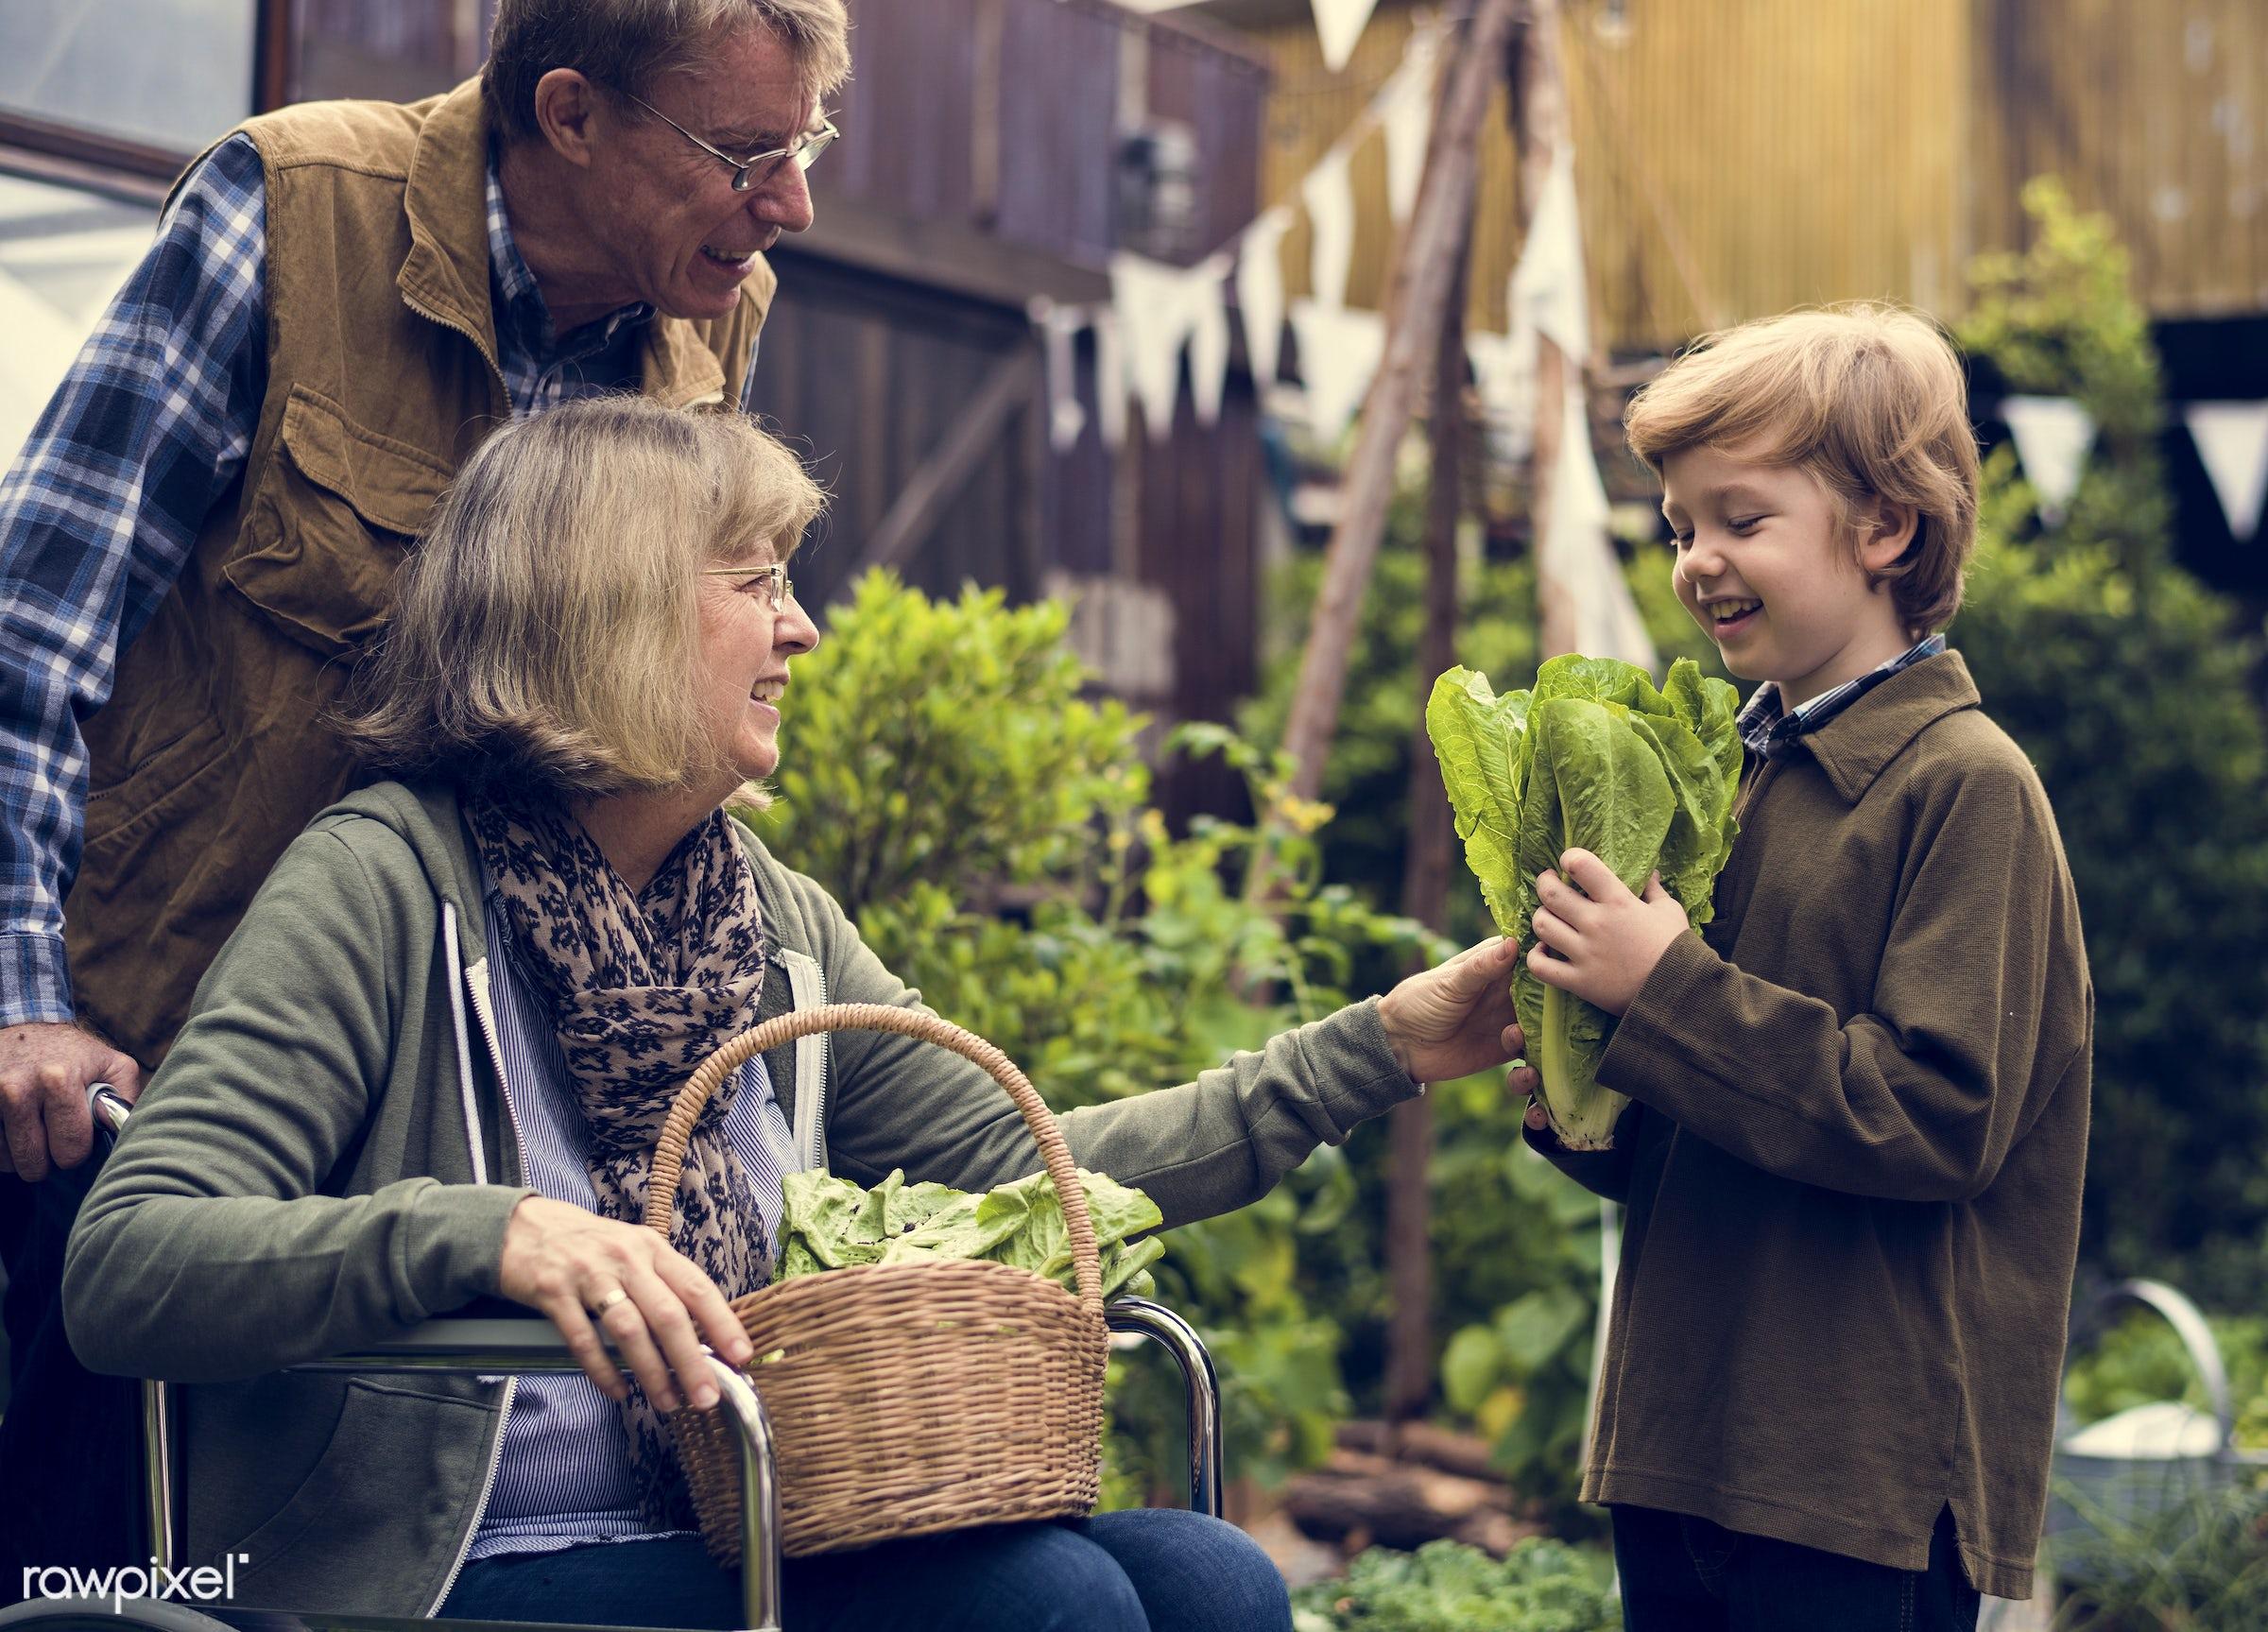 plant, nutritious, carrot, grandfather, basil, farmer, fresh, wheelchair, lettuce, family, woman, healthy eating, grandson,...